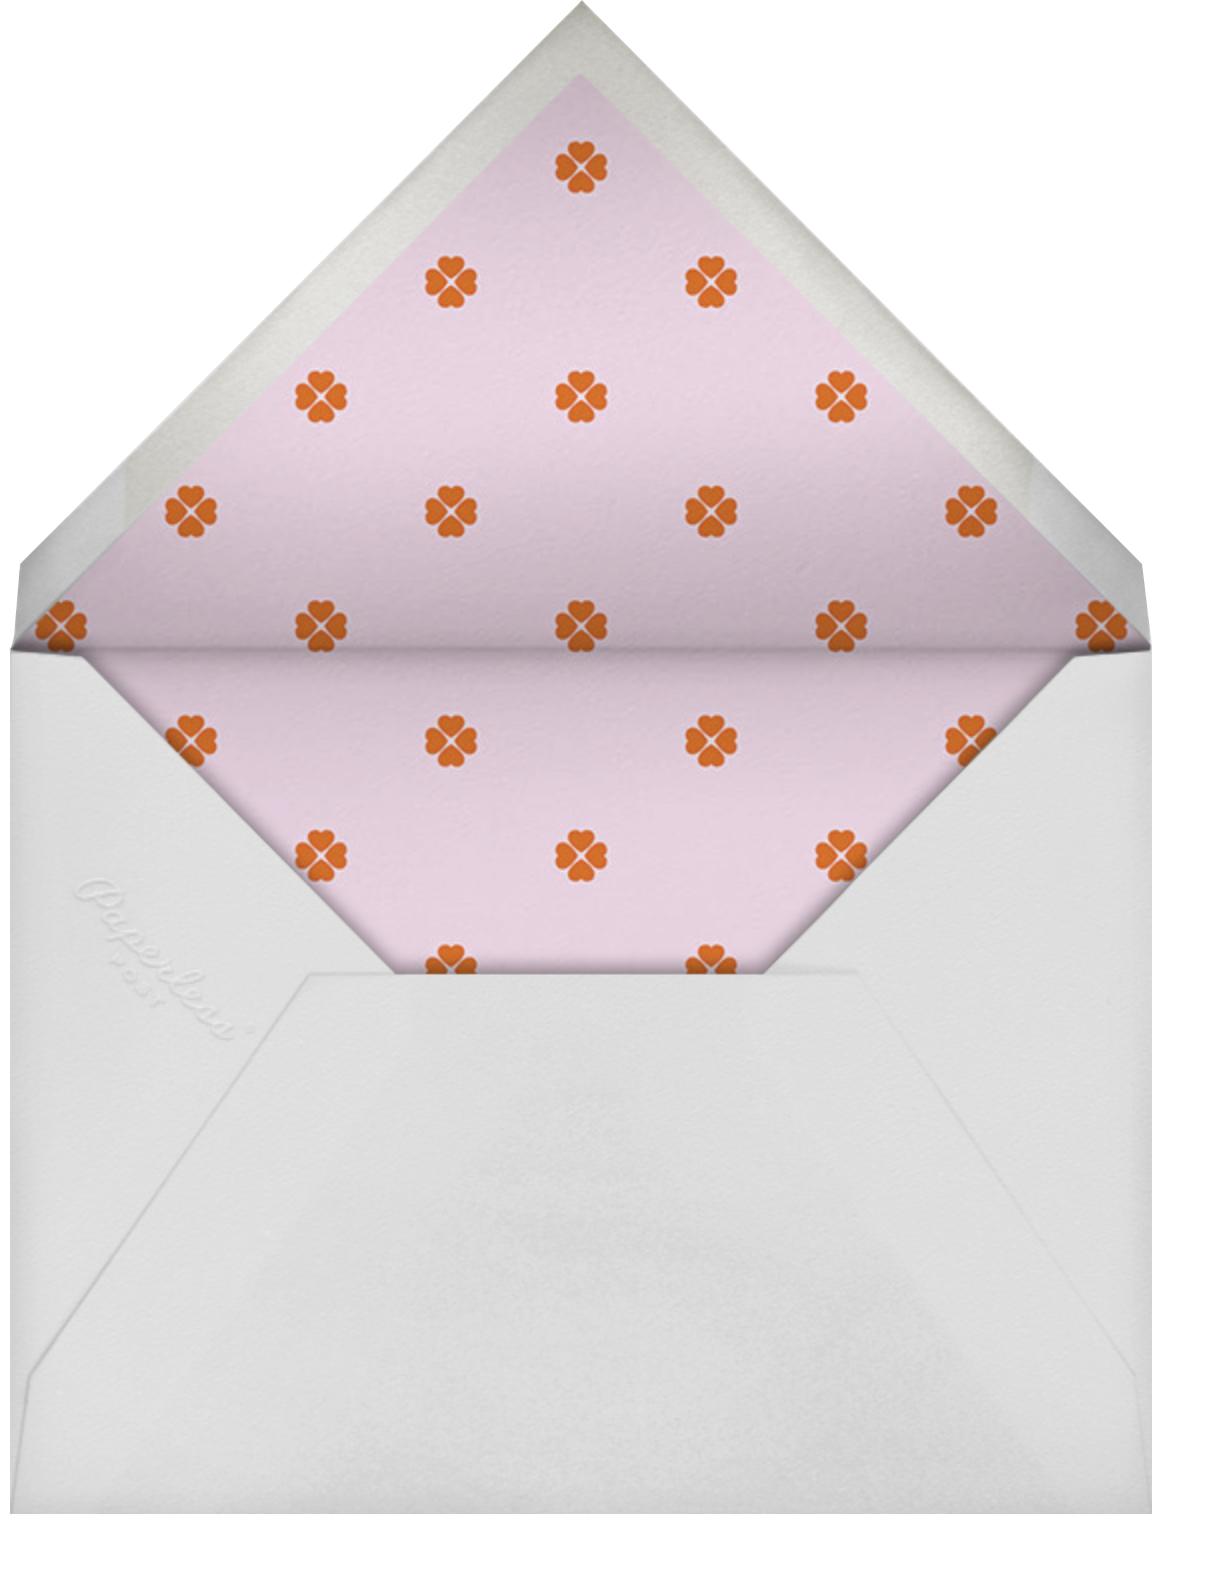 Colorblocked Stripes - Hydrangea/Longhorn - kate spade new york - Save the date - envelope back